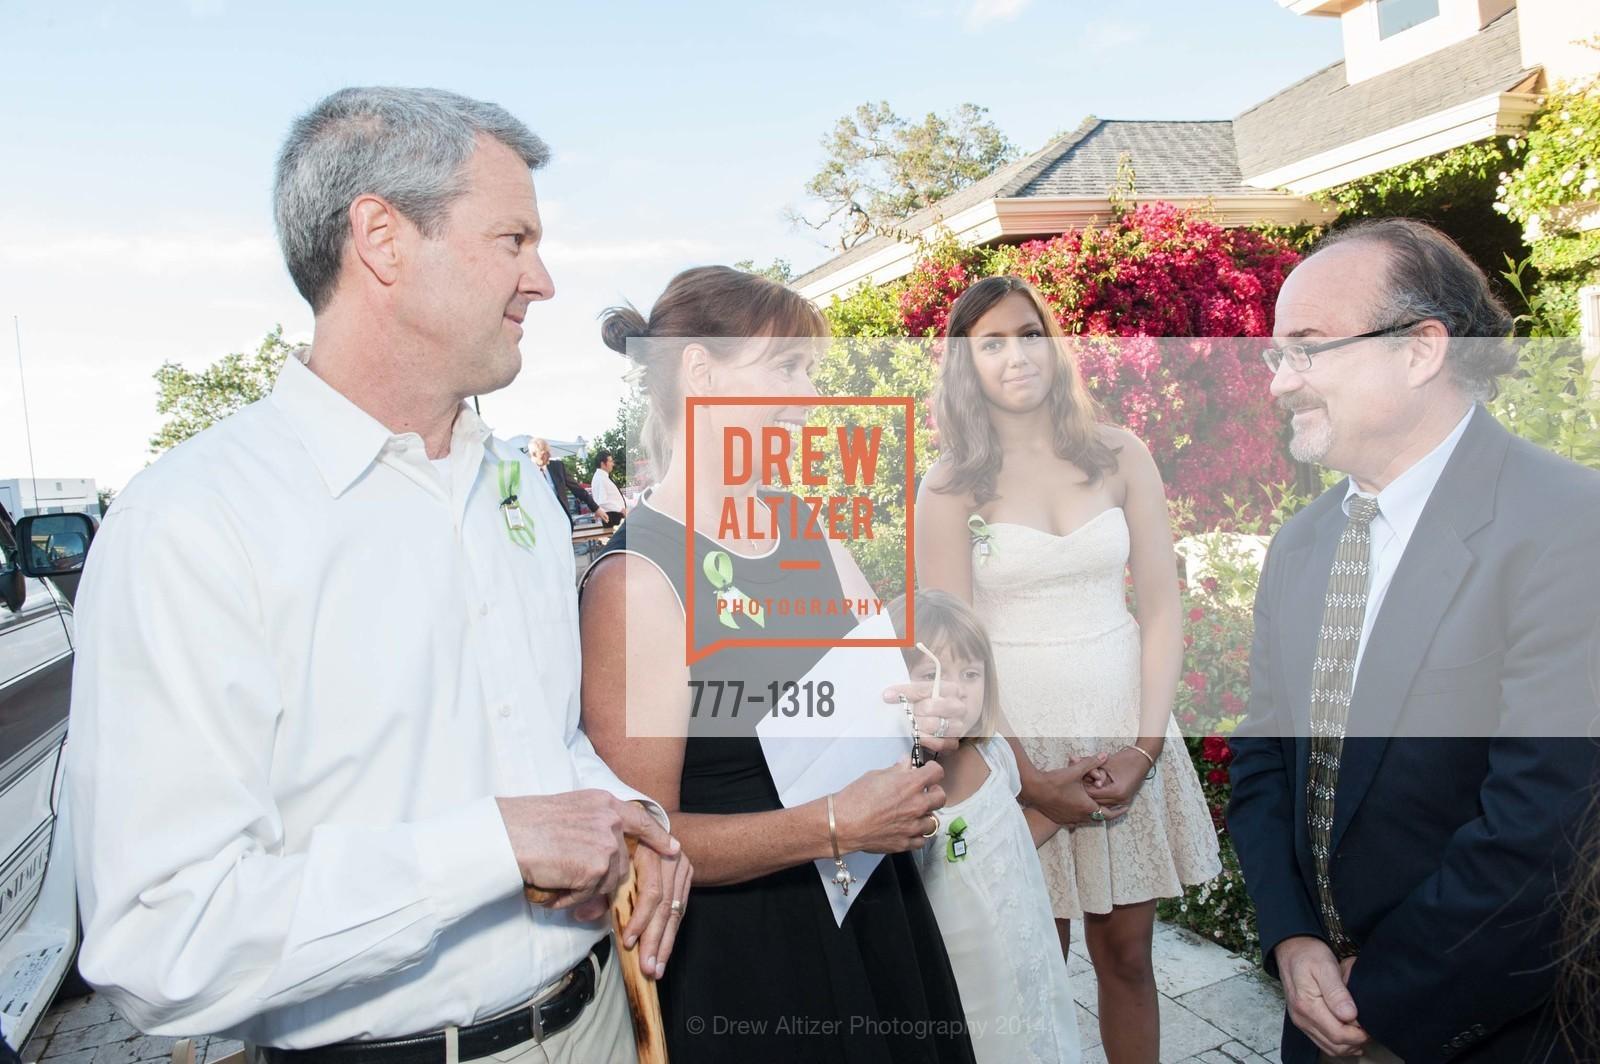 Scott Athearn, Camille Athearn, Bronte Athearn, John Aucott, Photo #777-1318